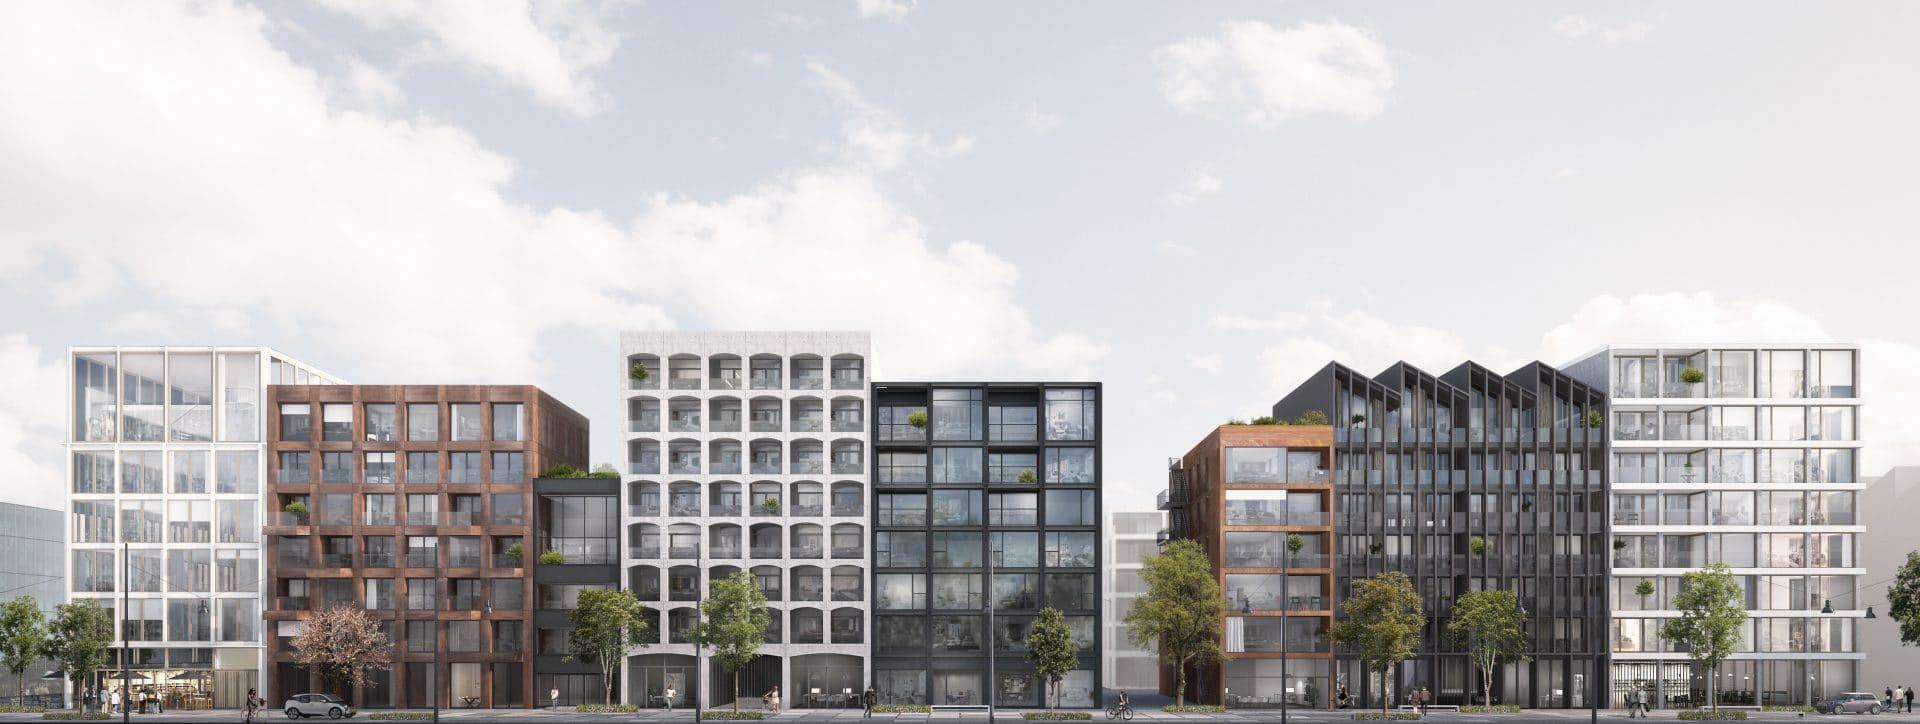 Flinke stap herontwikkeling Oostenburg met verkoop werven Stork Werkspoor